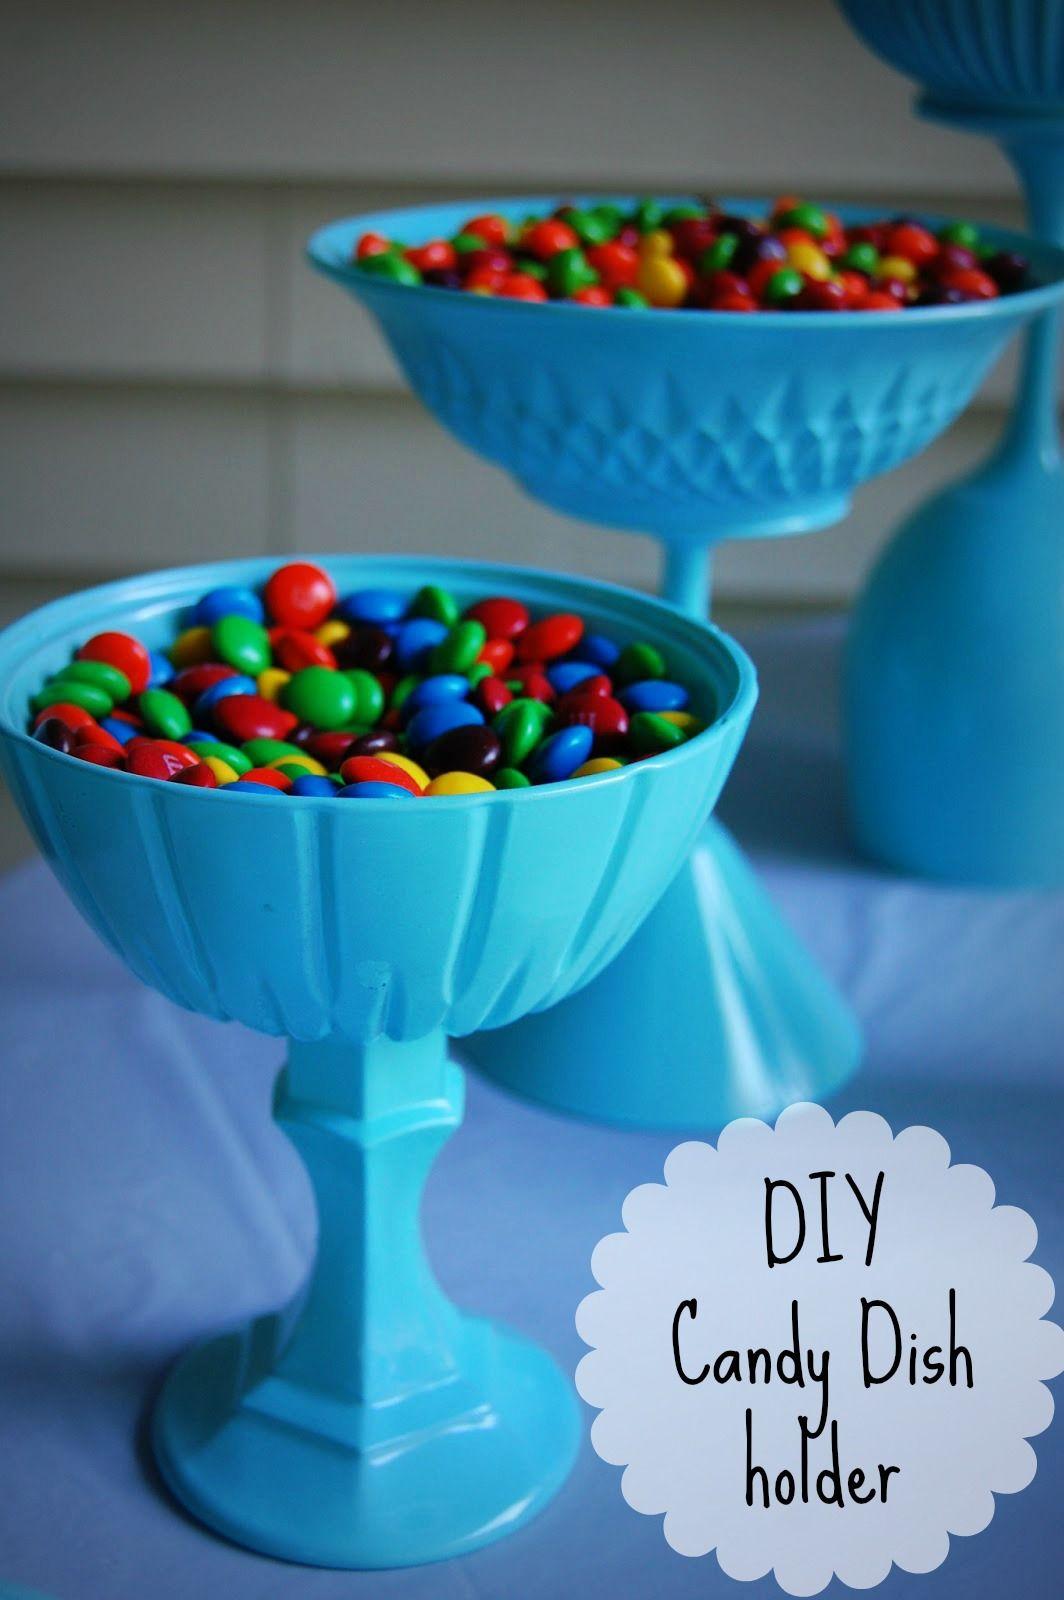 DIY Candy dish..from the Dolla Tree | Candy dish diy, Diy ...